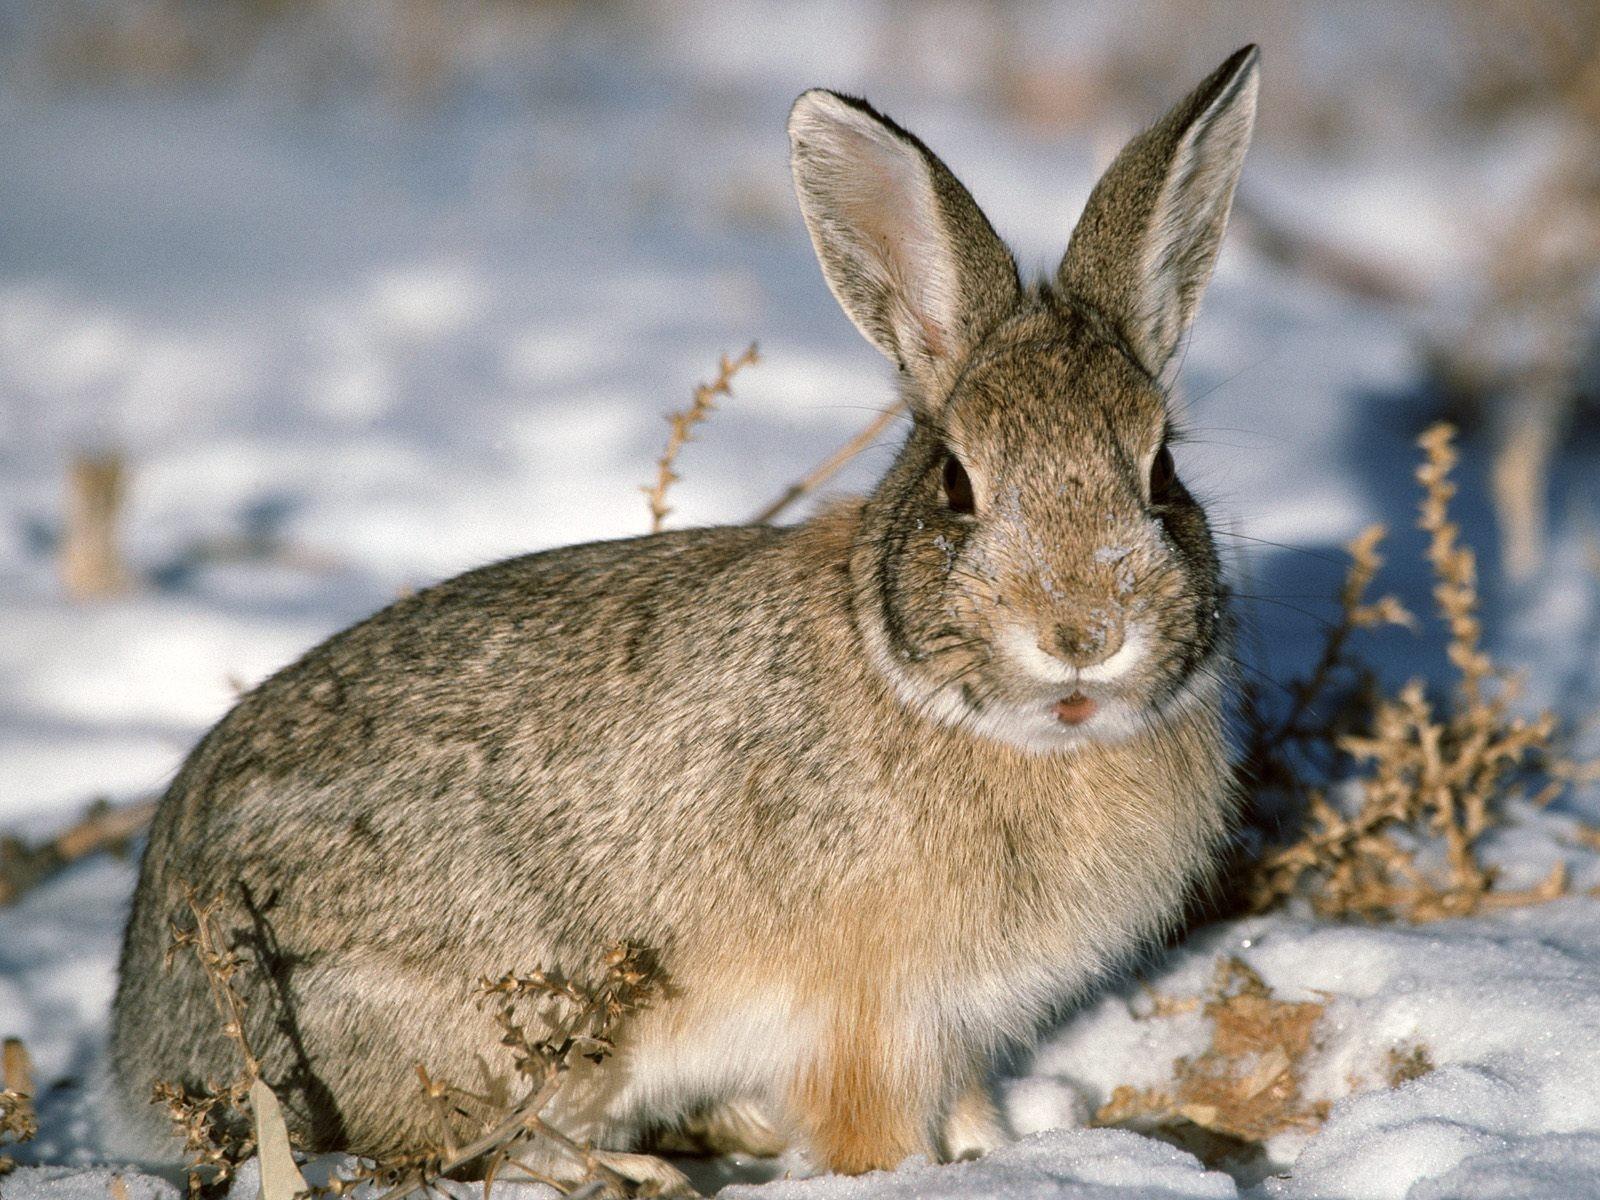 Photos of Bunny Rabbits in Winter